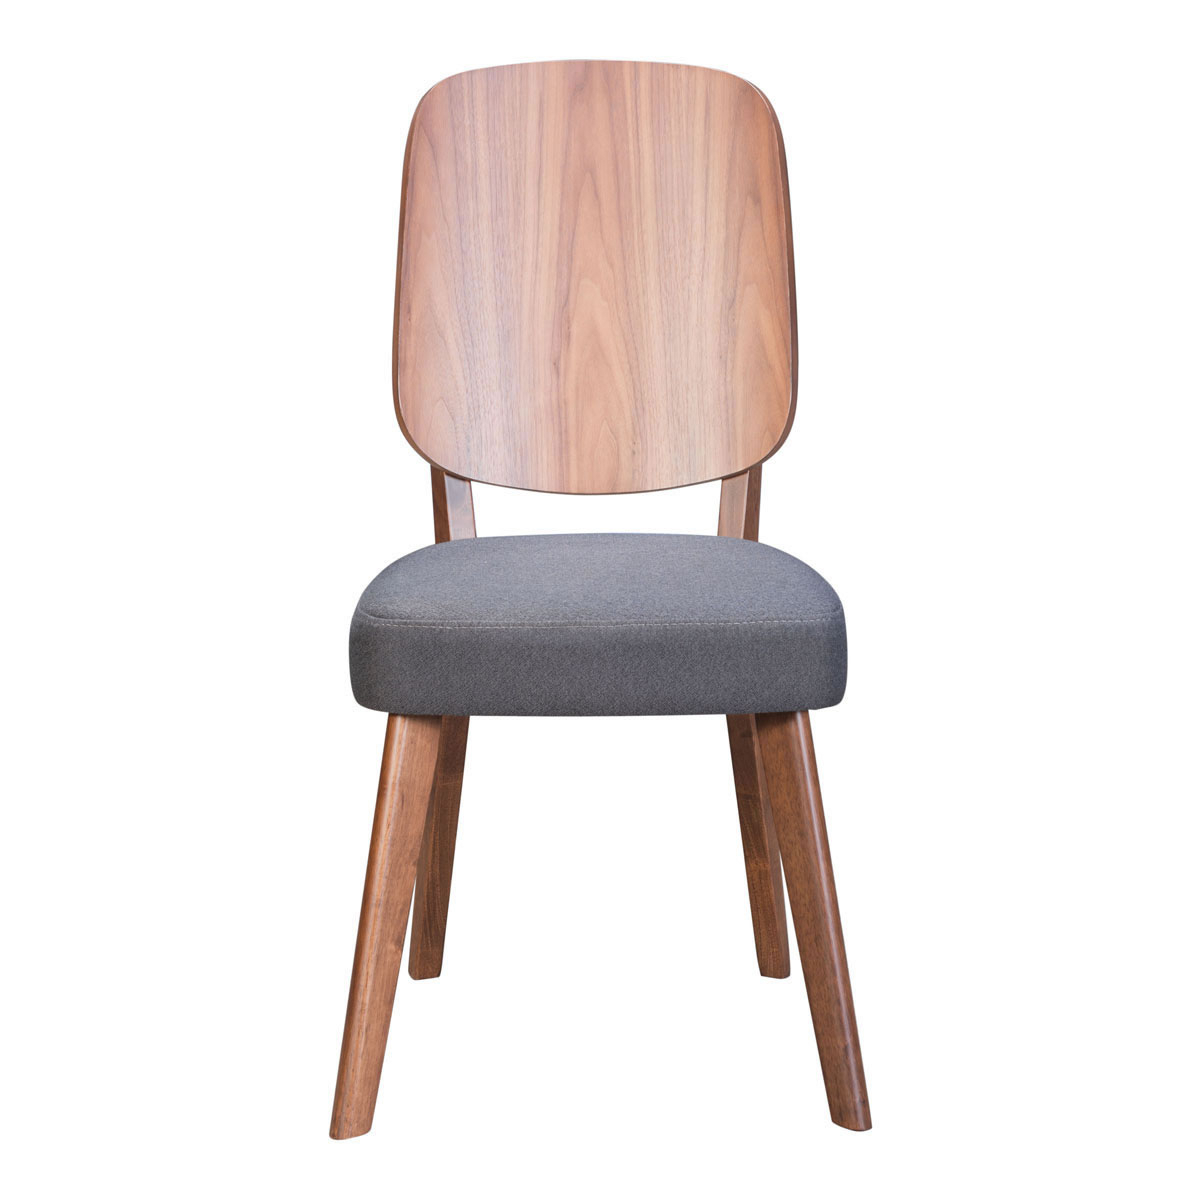 Preferred Honoria 3 Piece Dining Sets Pertaining To Alberta Dining Chair Walnut & Dark Gray (View 12 of 20)